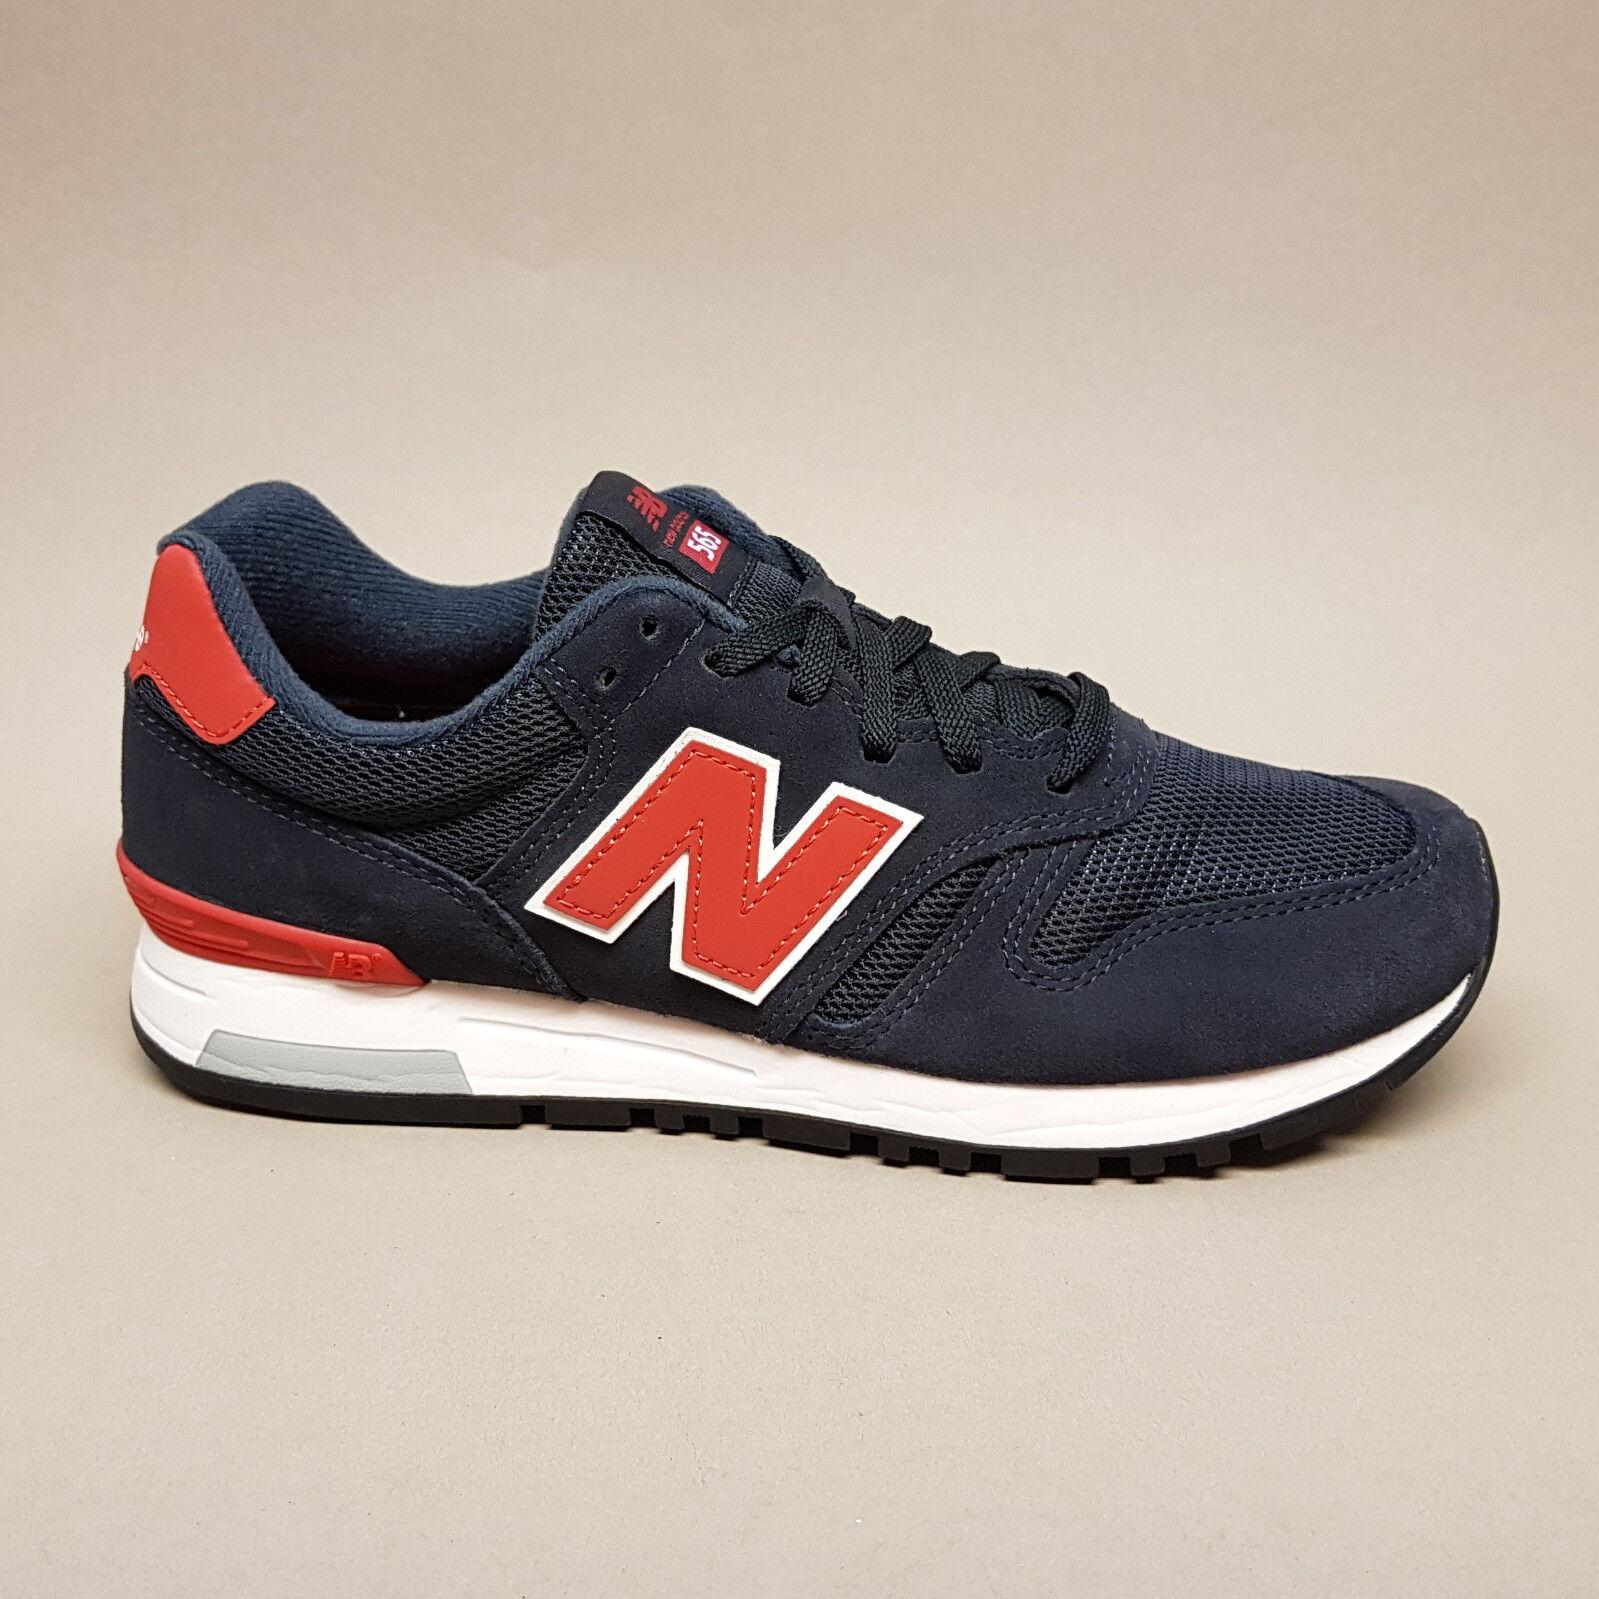 New Balance Classics ML565NTW Navy Red Turnschuhe Sneaker blau rot unisex